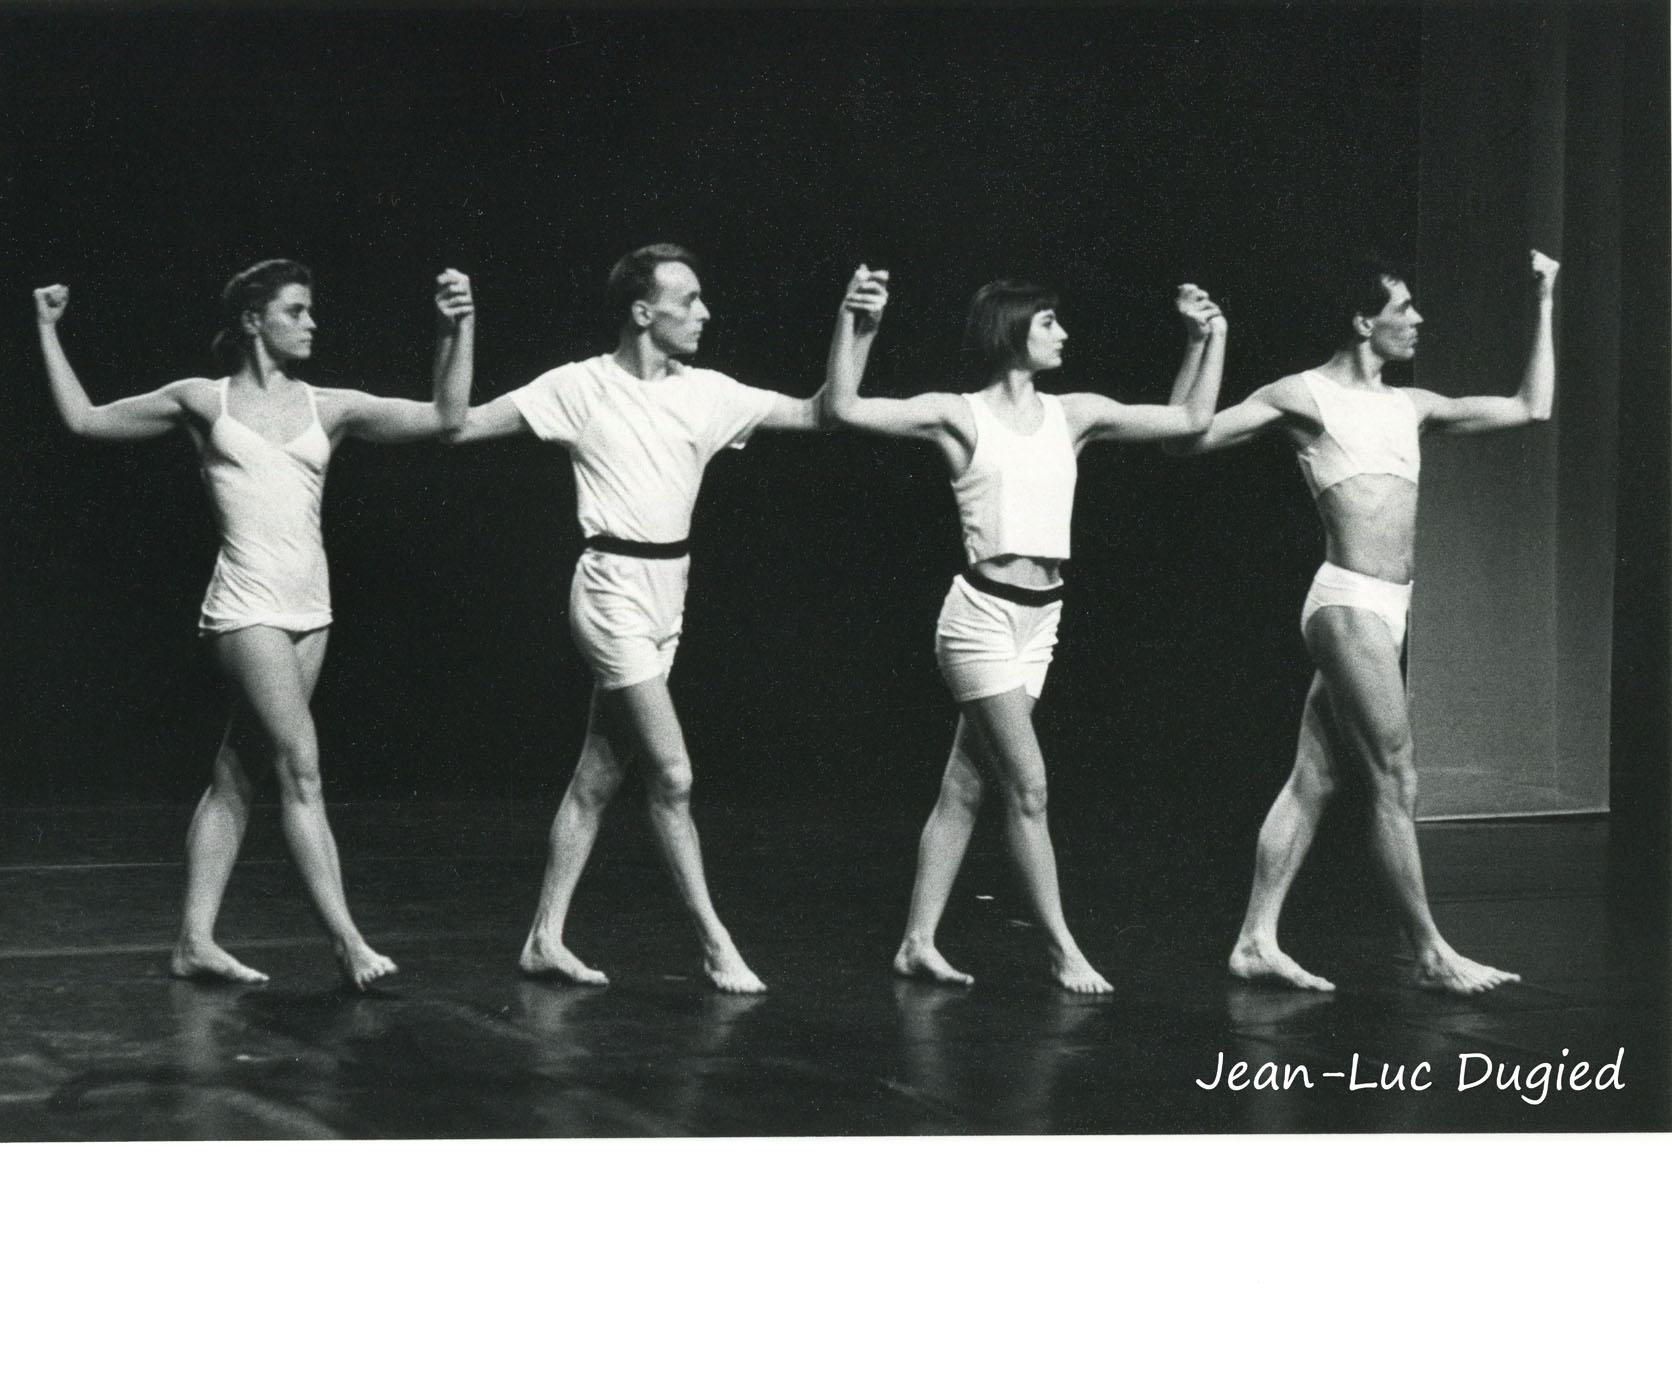 41 Dugied Fabrice - bohème - avec Geneviève Mazin,  Marie Martin et Bernard Collin - 1988